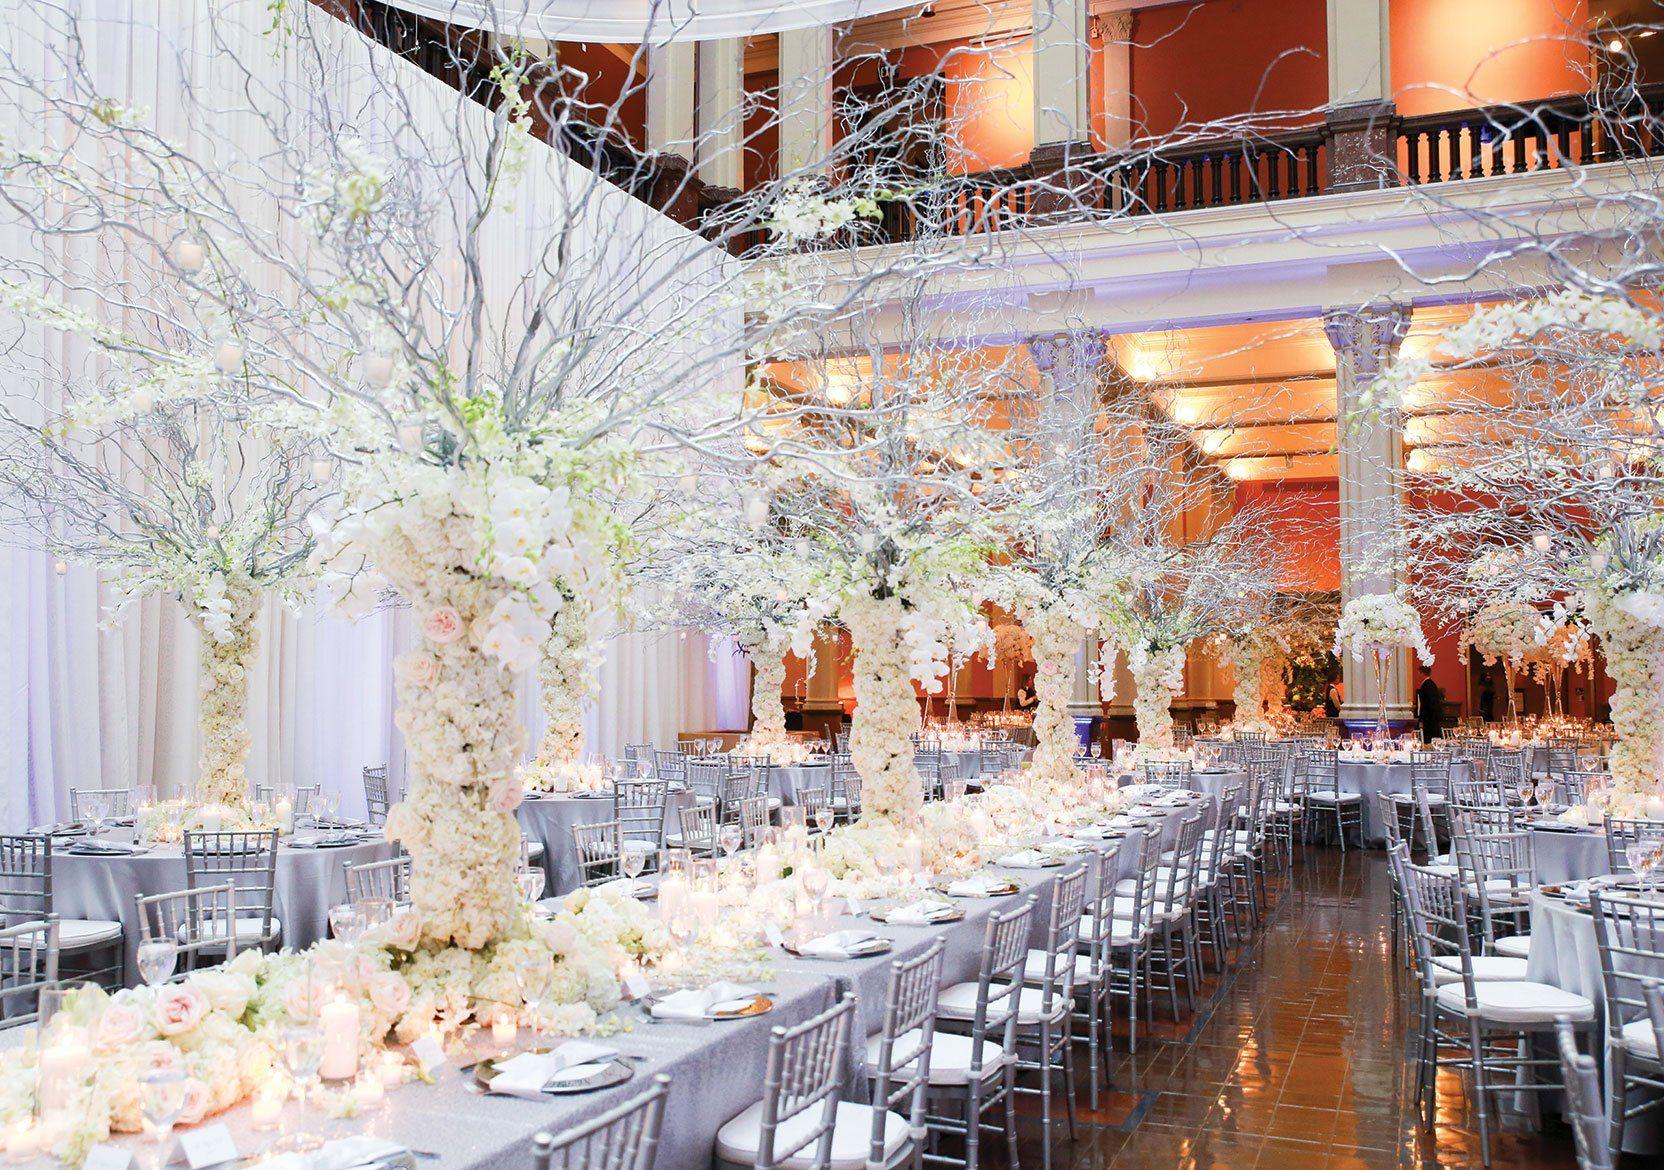 Wedding hall decoration images  HaleyandMattweddingreceptiong  Venue Decor  Pinterest